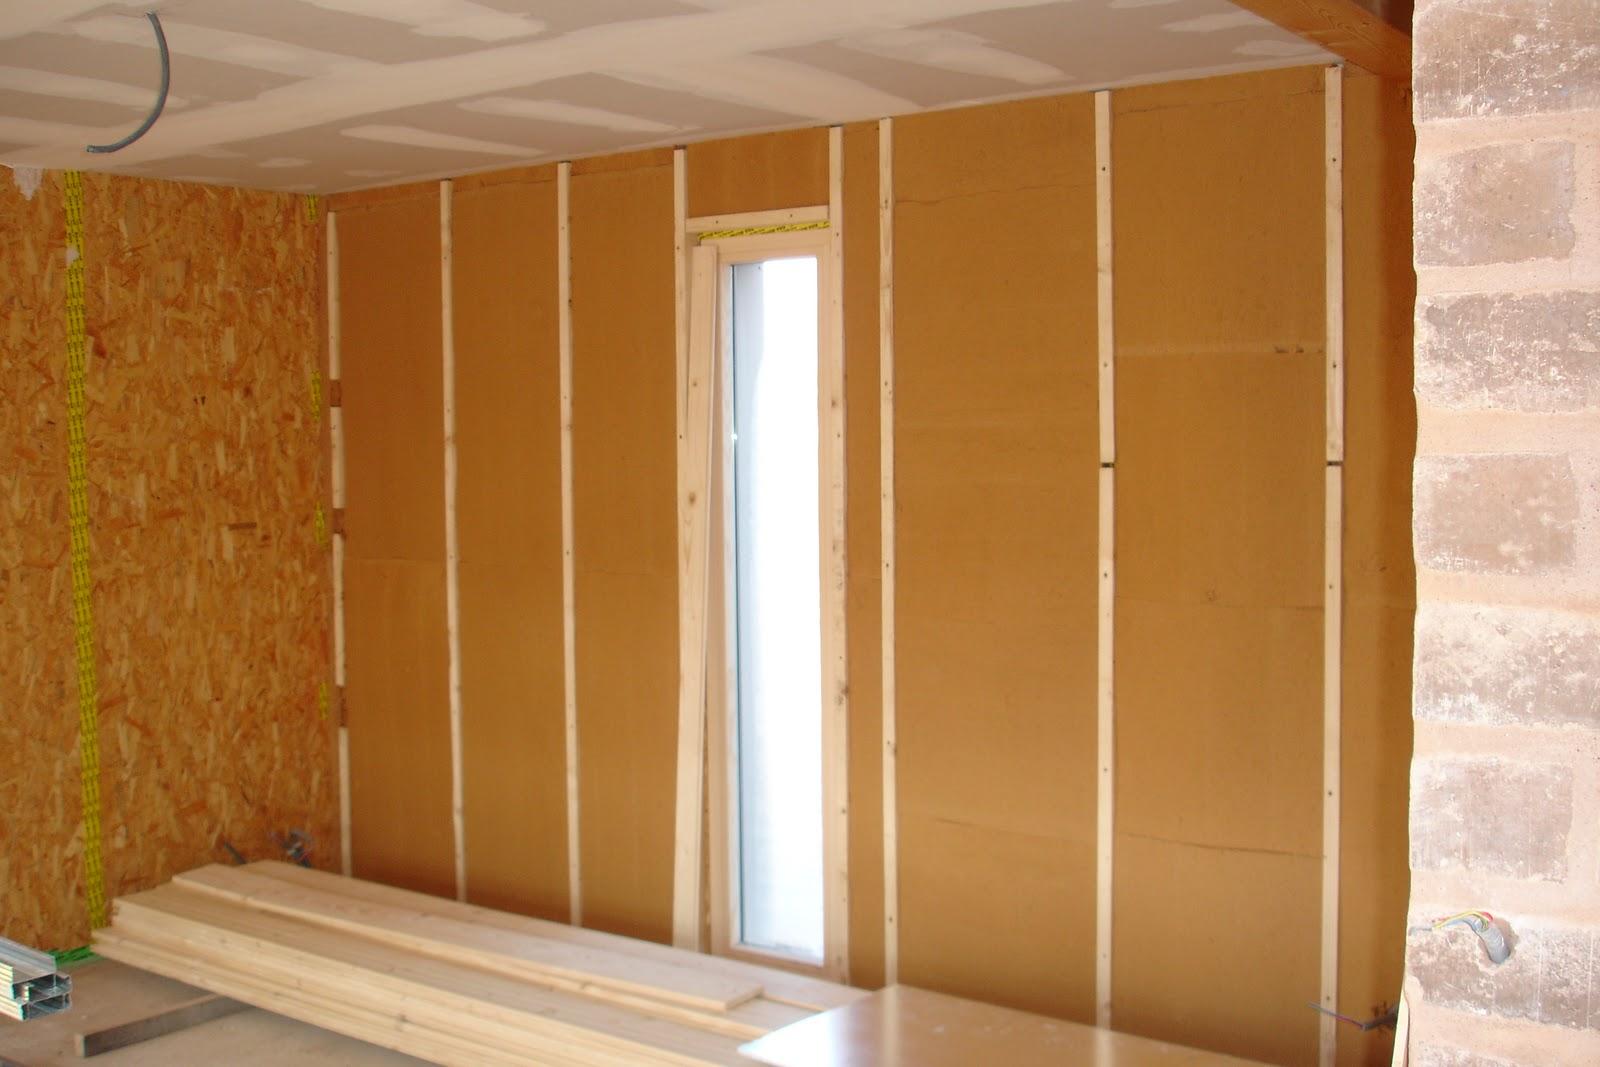 tapisserie lambris castorama devie travaux. Black Bedroom Furniture Sets. Home Design Ideas